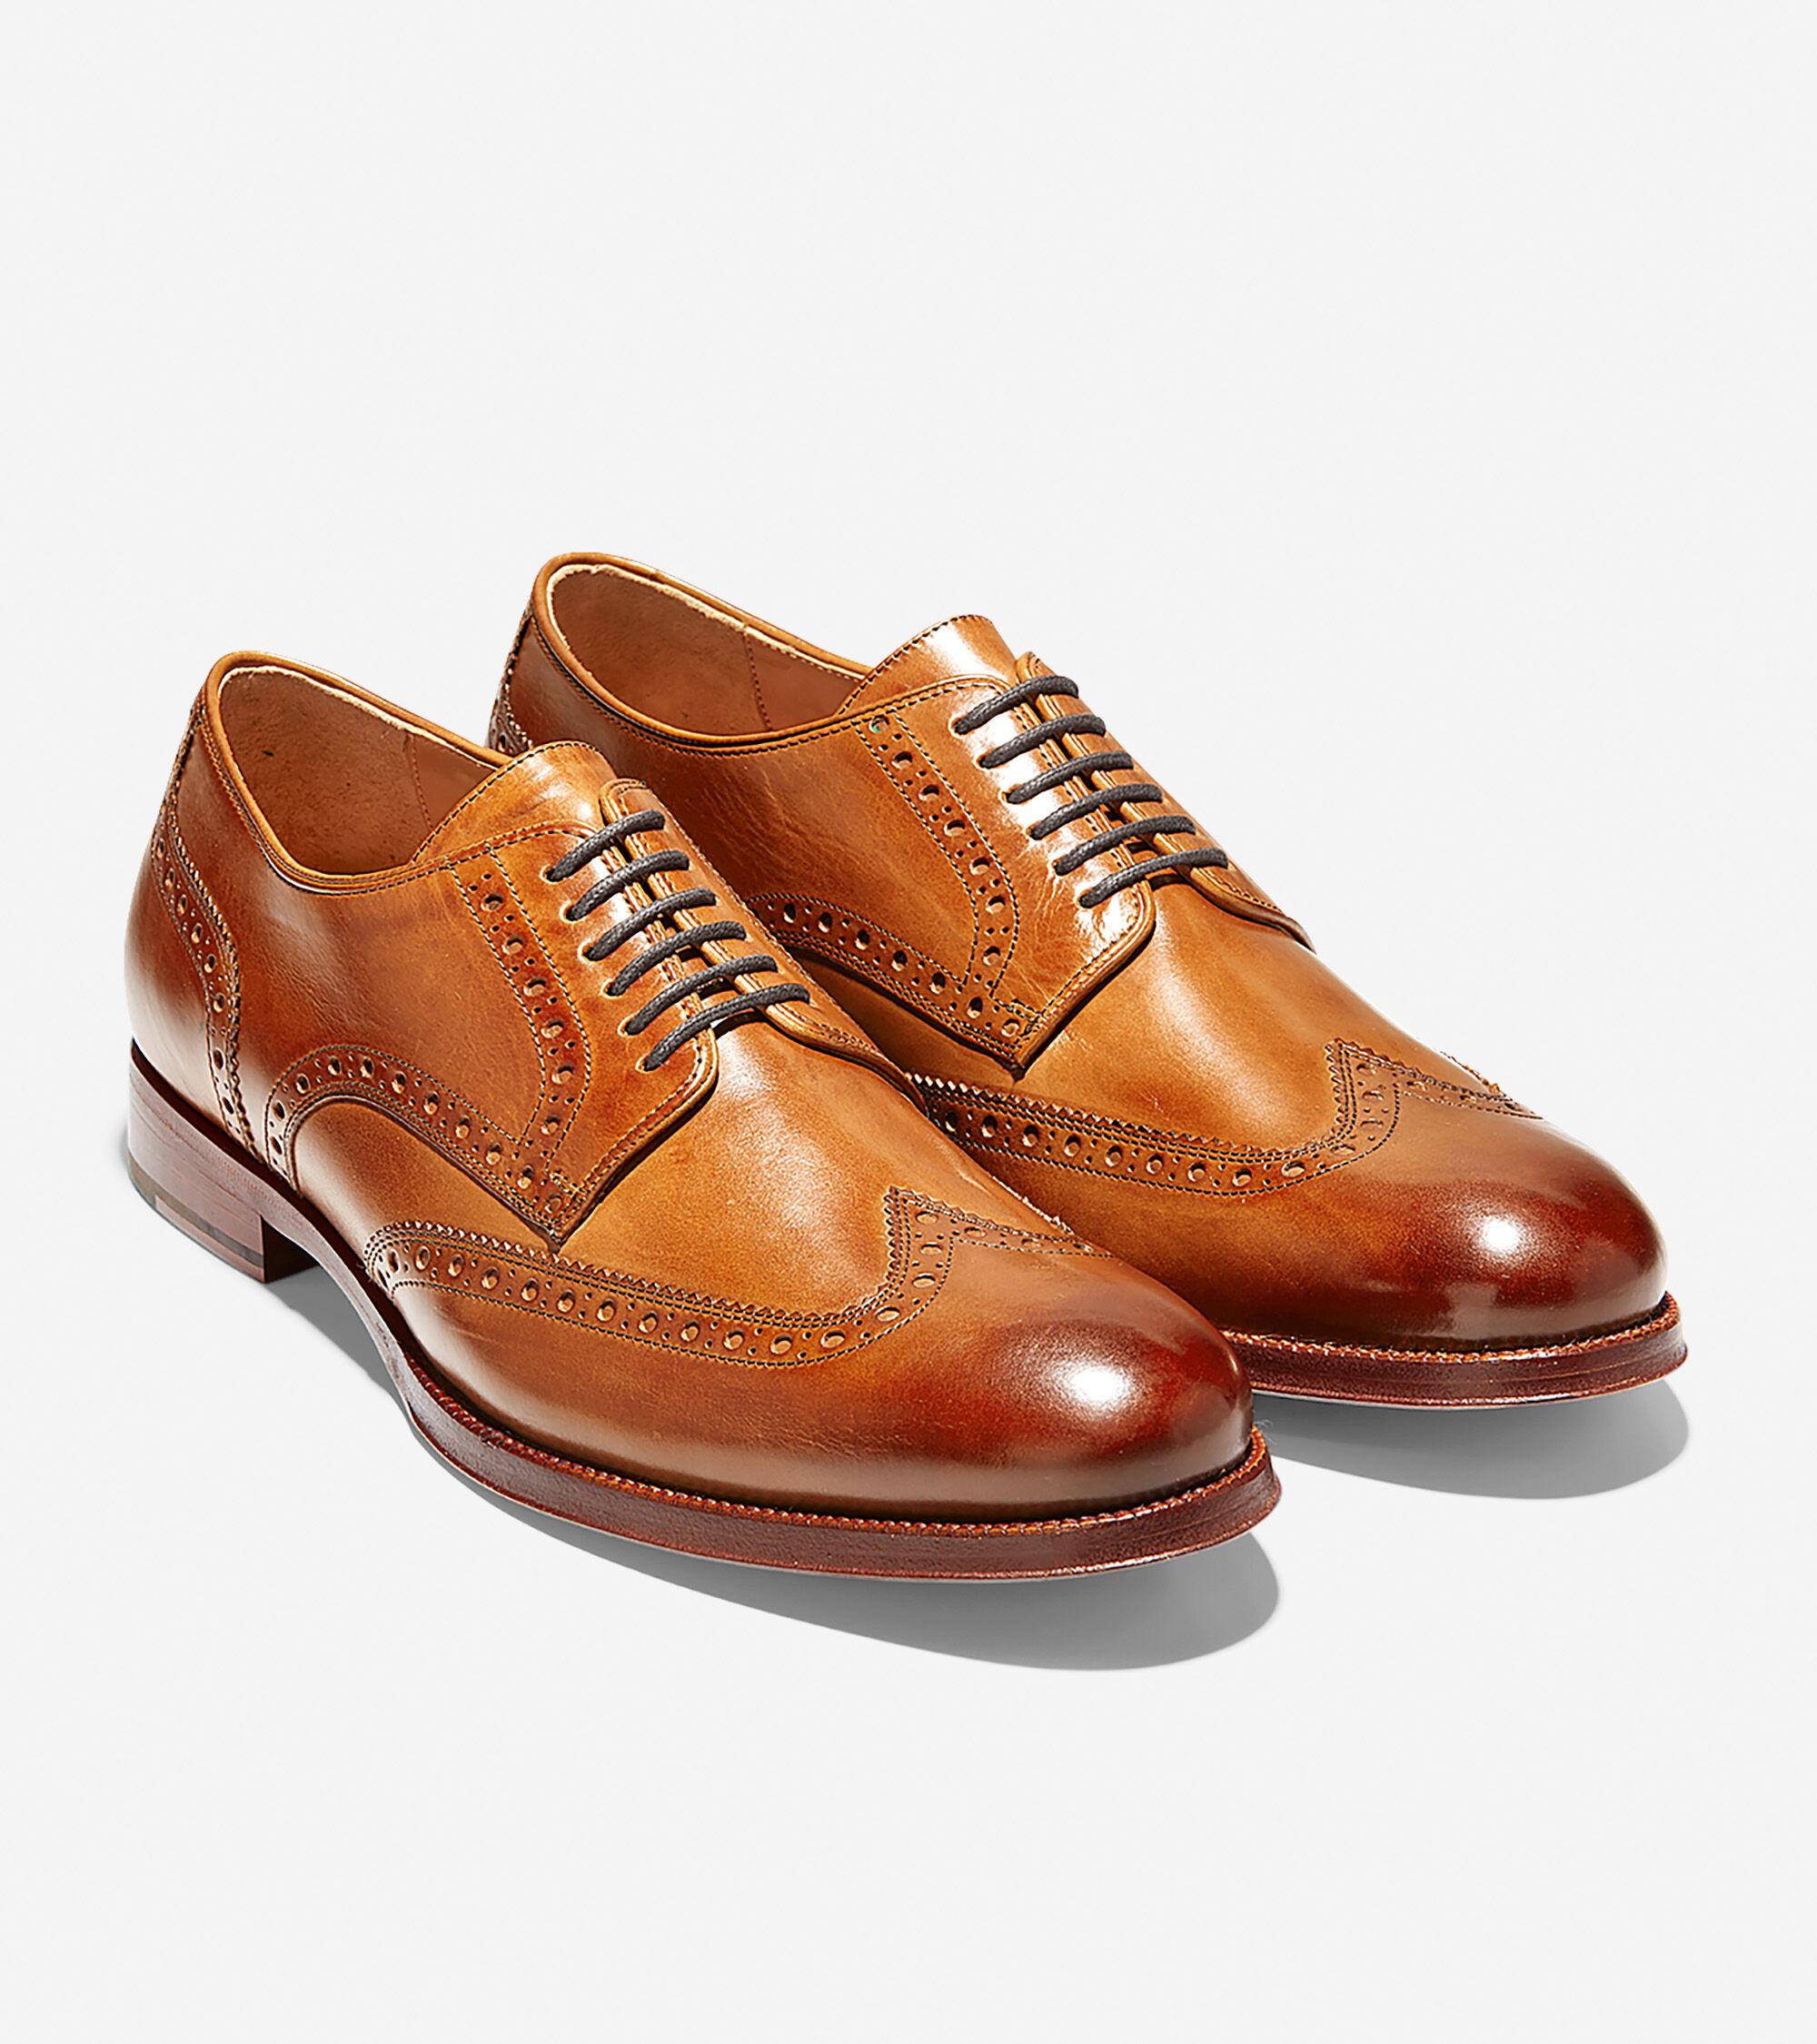 ... Cole Haan American Classic Gramercy Derby Wingtip Oxford ... ec2881ca5